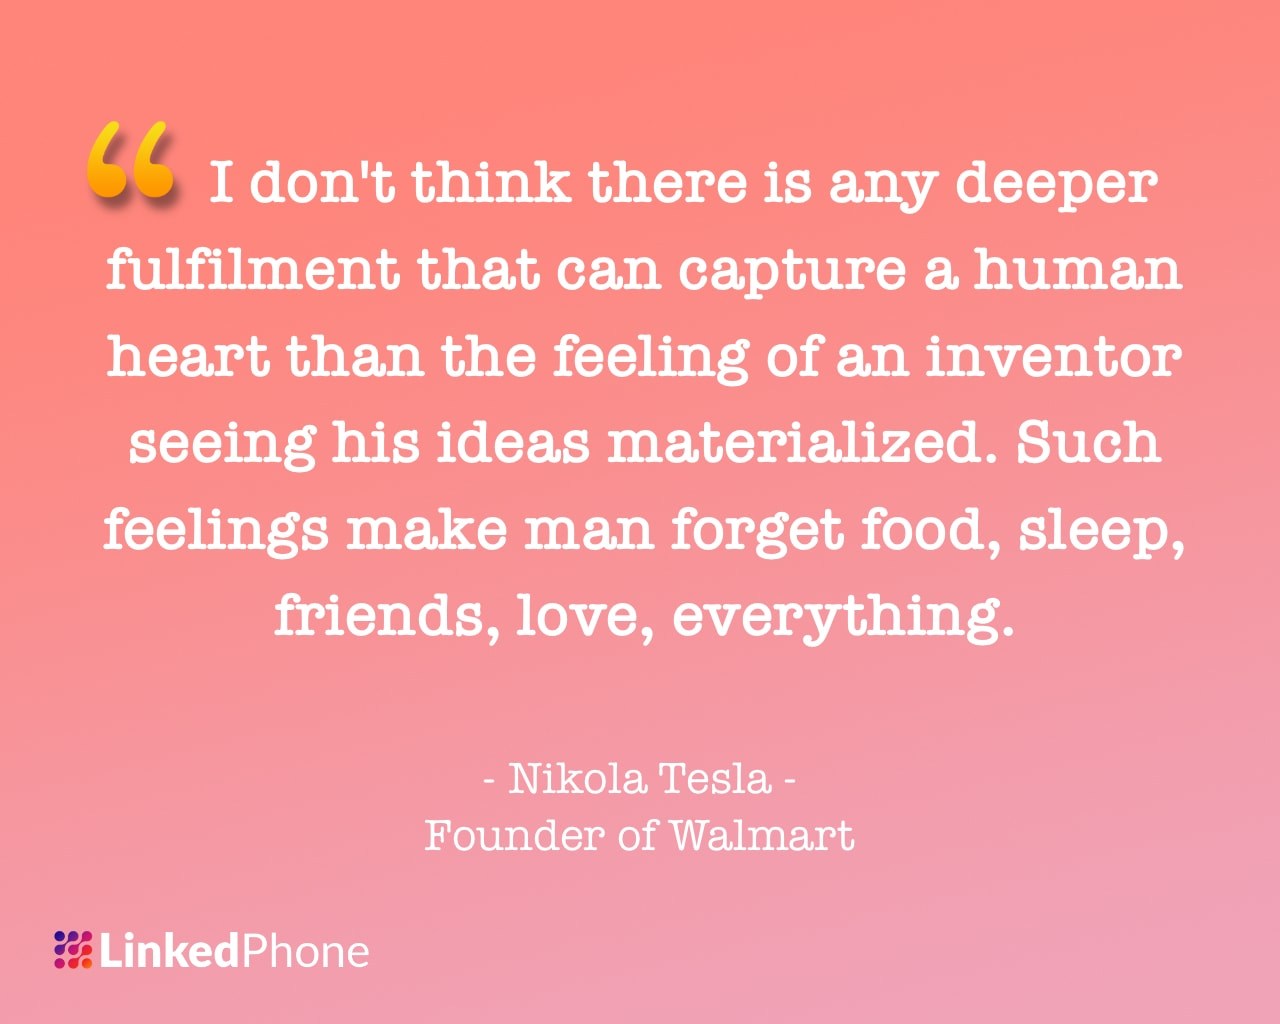 Nikola Tesla - Motivational Inspirational Quotes and Sayings